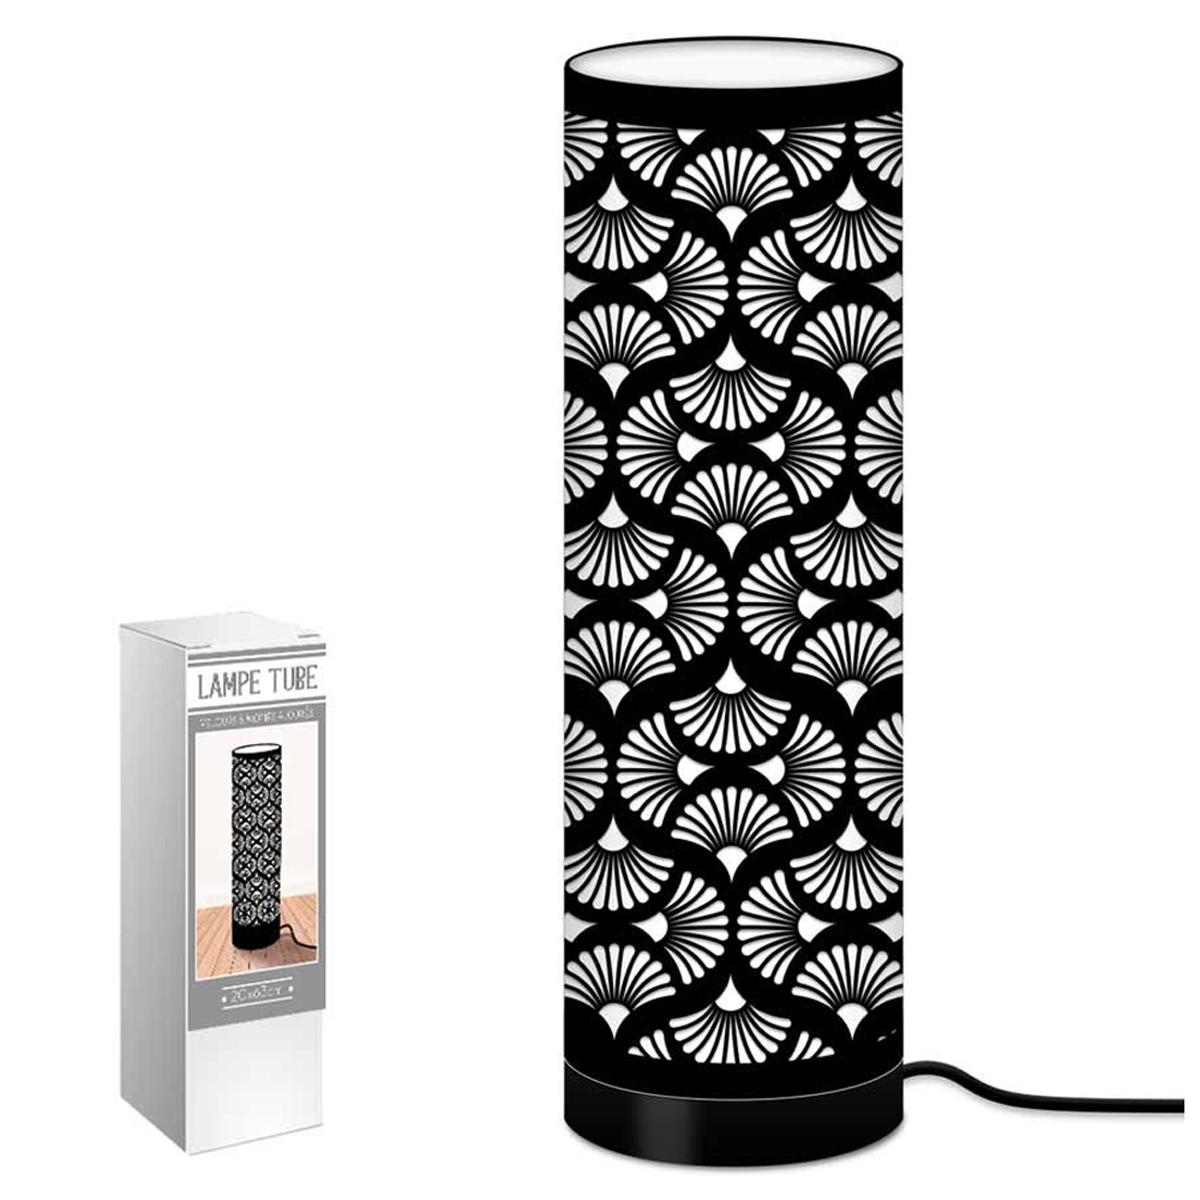 Lampe tube tissu \'Boho\' noir (ginkgo biloba) - 63x20 cm - [Q9074]